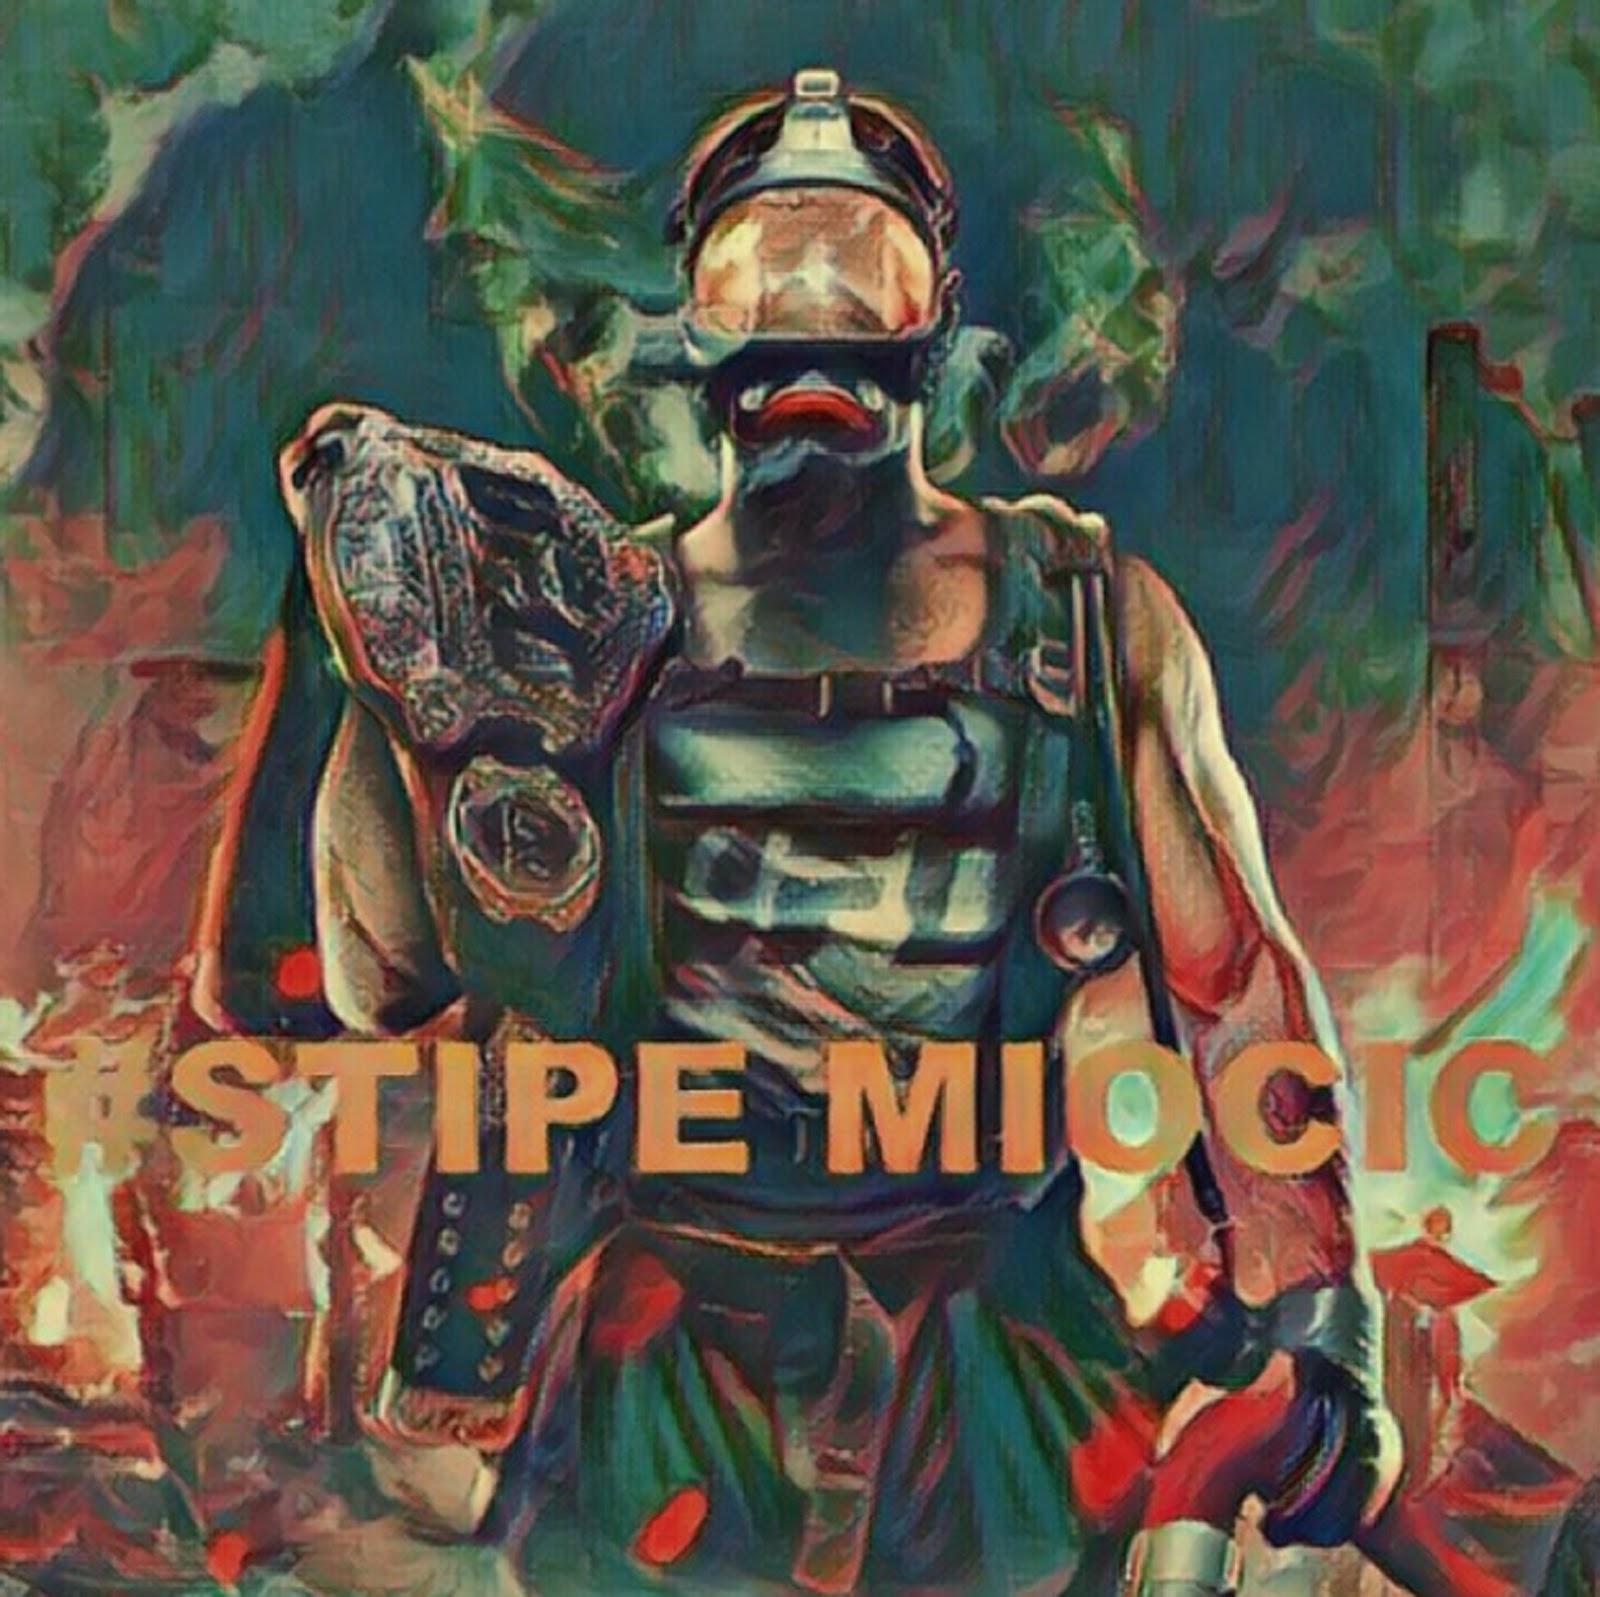 STIPE MIOCIC 3